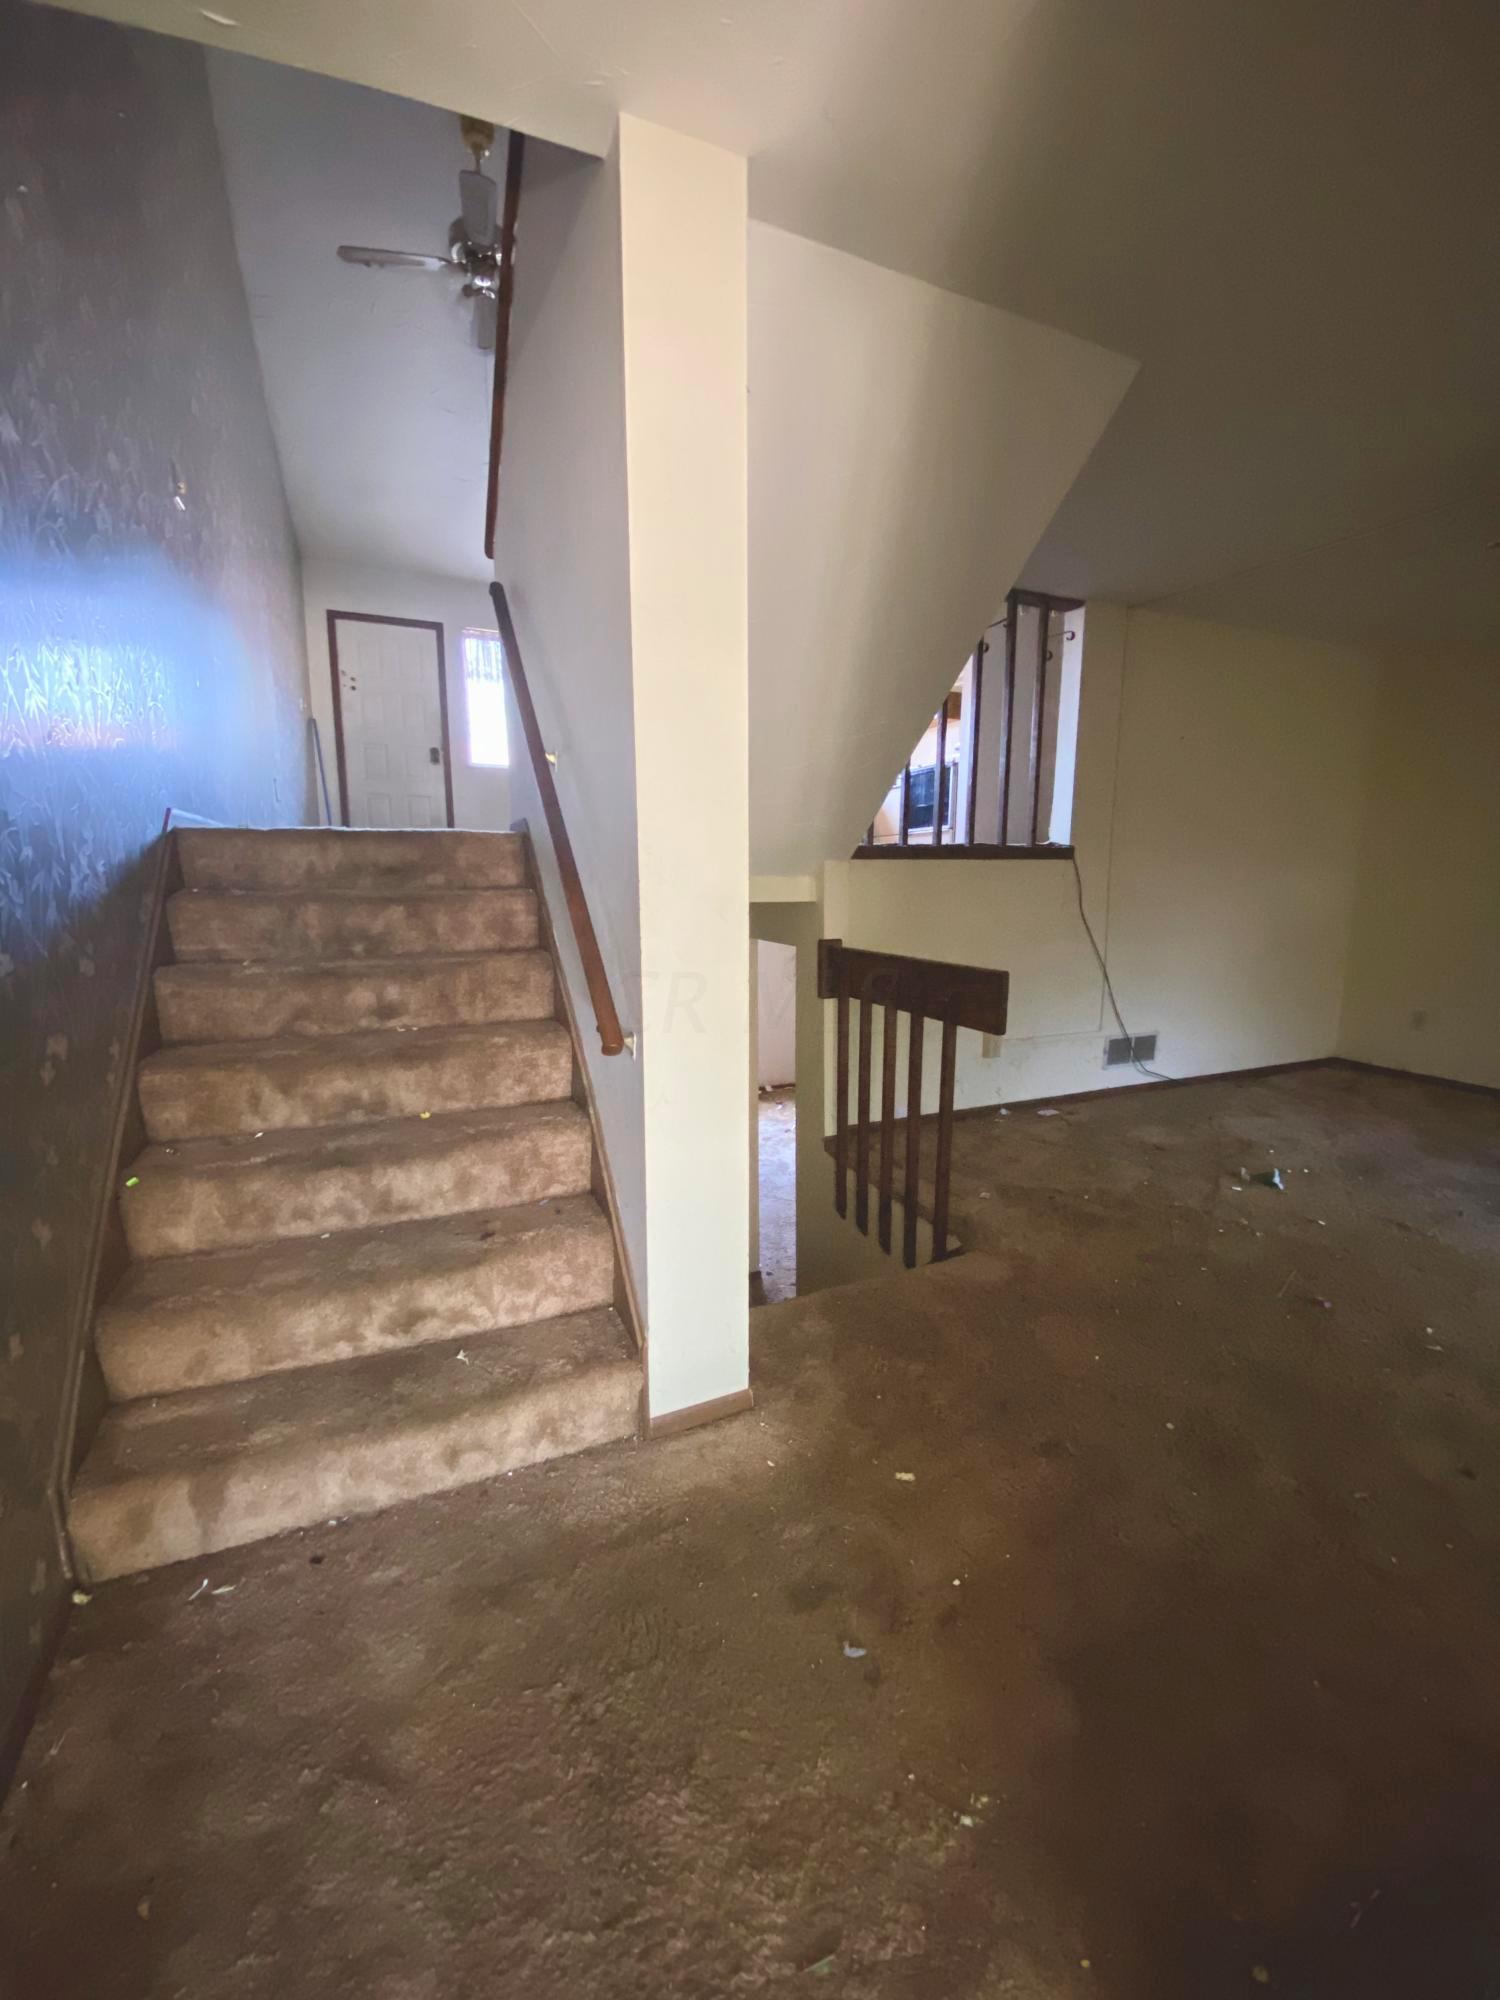 455 North Street, Worthington, Ohio 43085, 2 Bedrooms Bedrooms, ,2 BathroomsBathrooms,Residential,For Sale,North,220025198